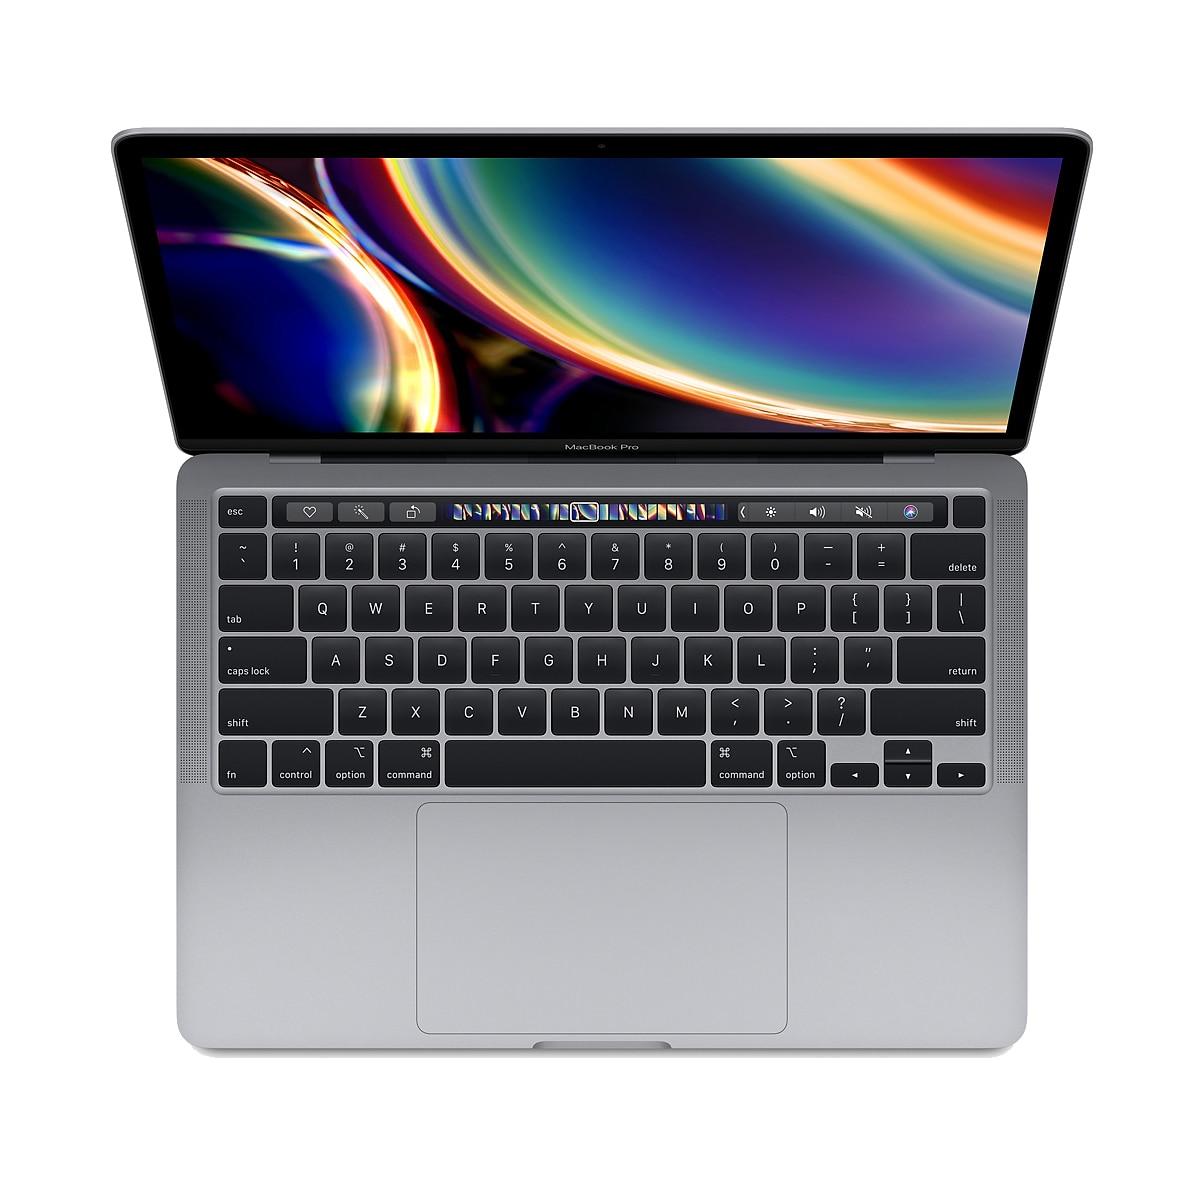 MacBook Pro 13-inch i7 2.3GHz 16GB 512GB Space Gray